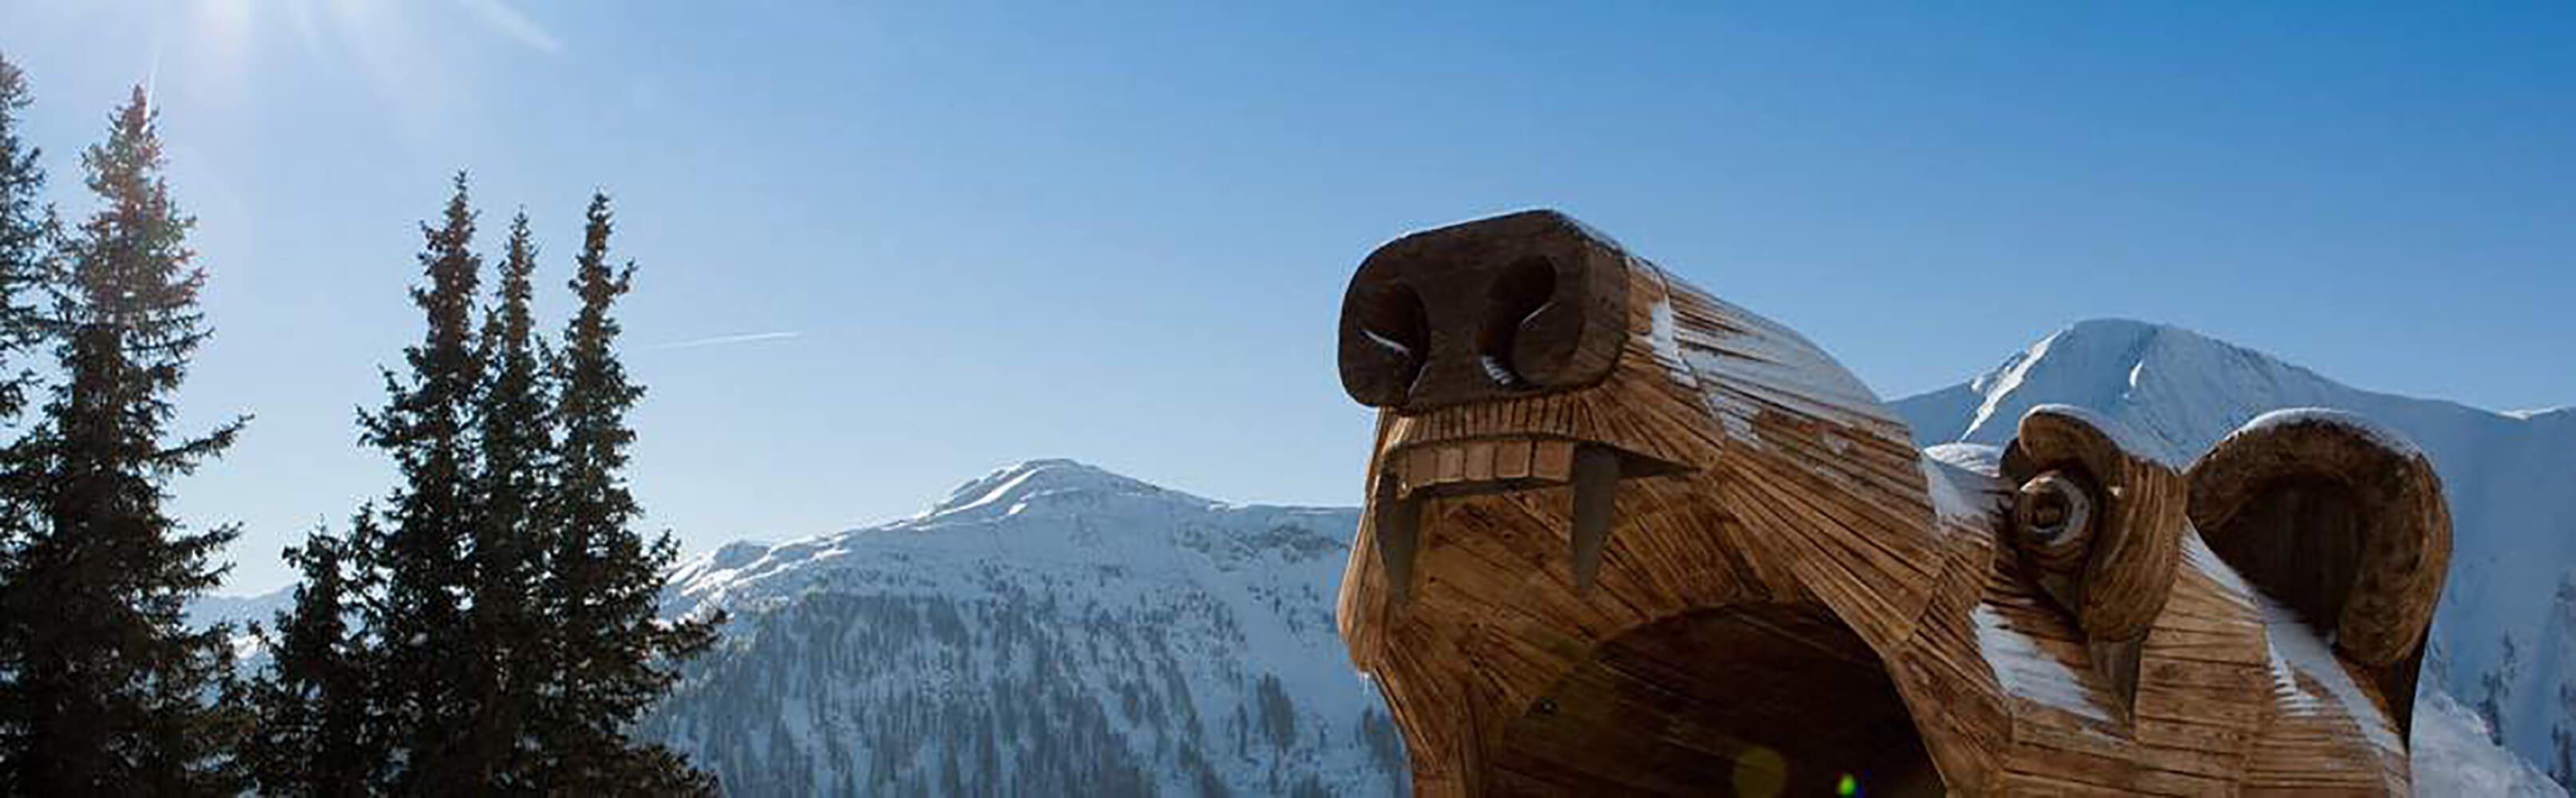 Serfaus-Fiss-Ladis- das Winterabenteuer 1